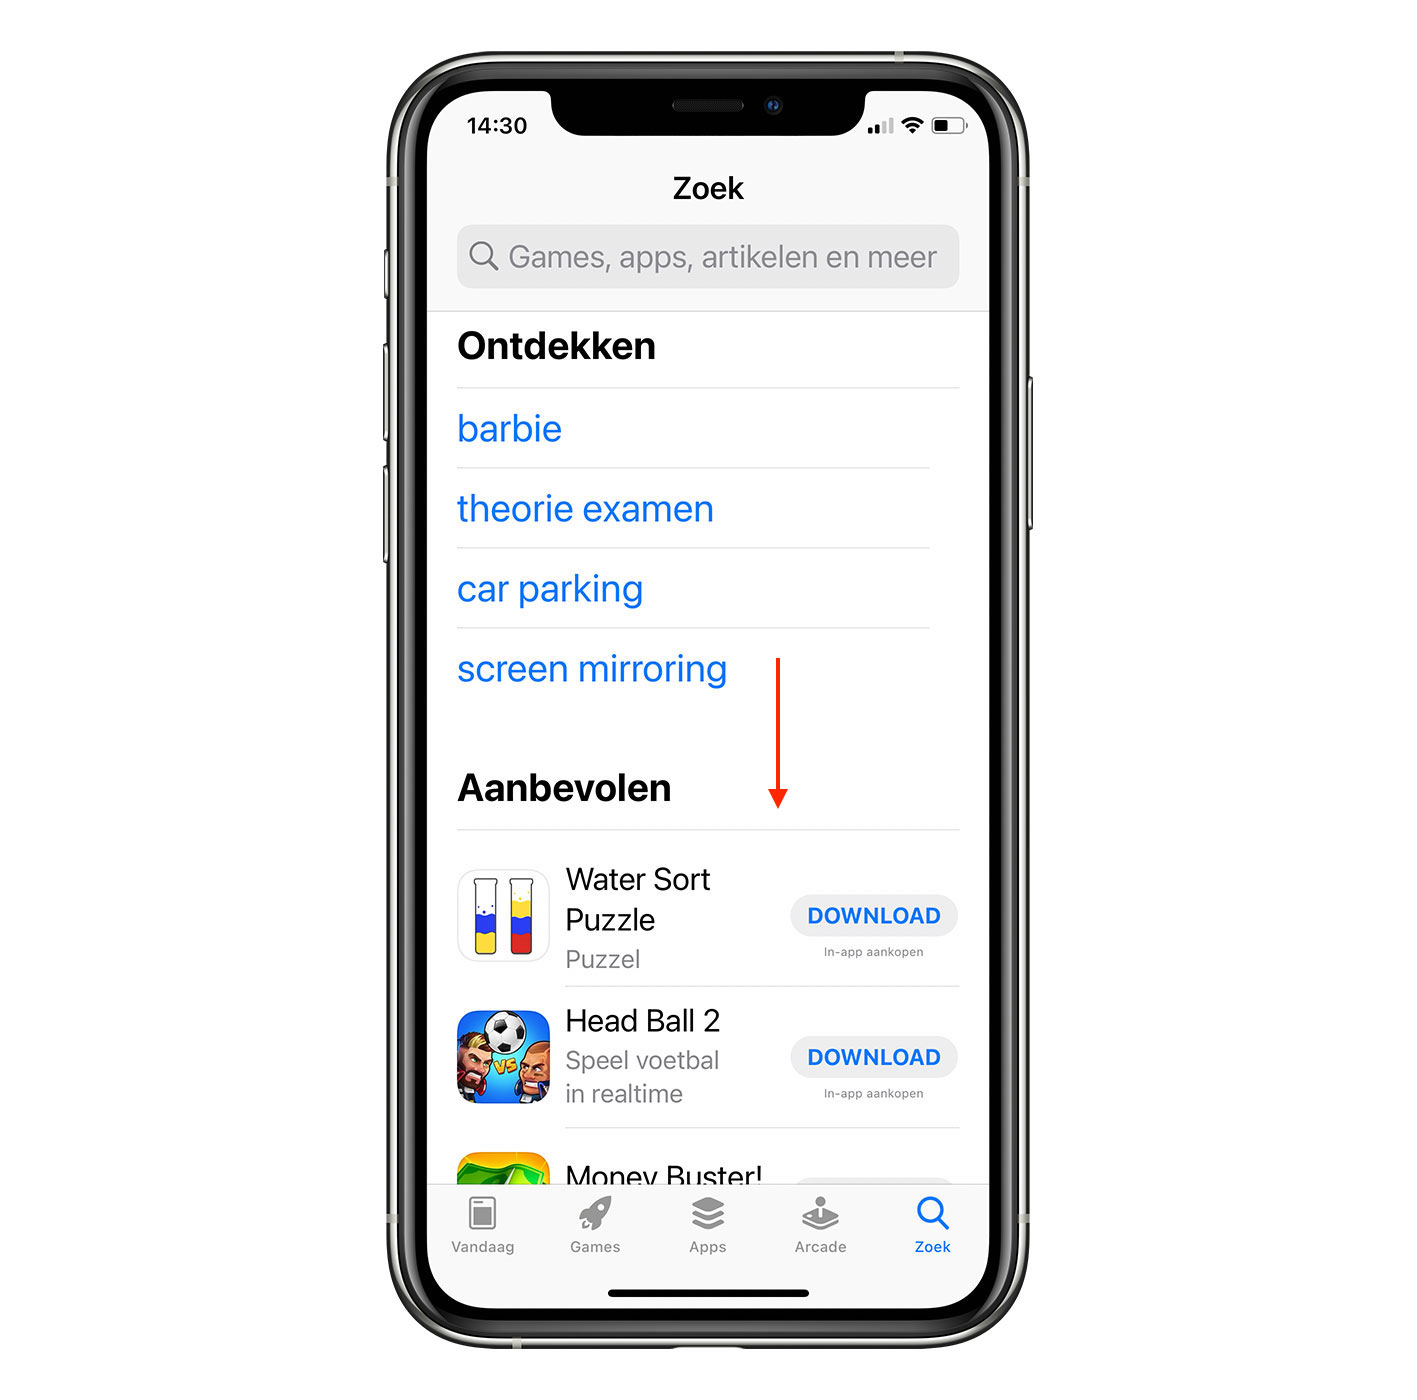 https://www.macfreak.nl/modules/news/images/zArt.AppStoreReclame120521.jpg